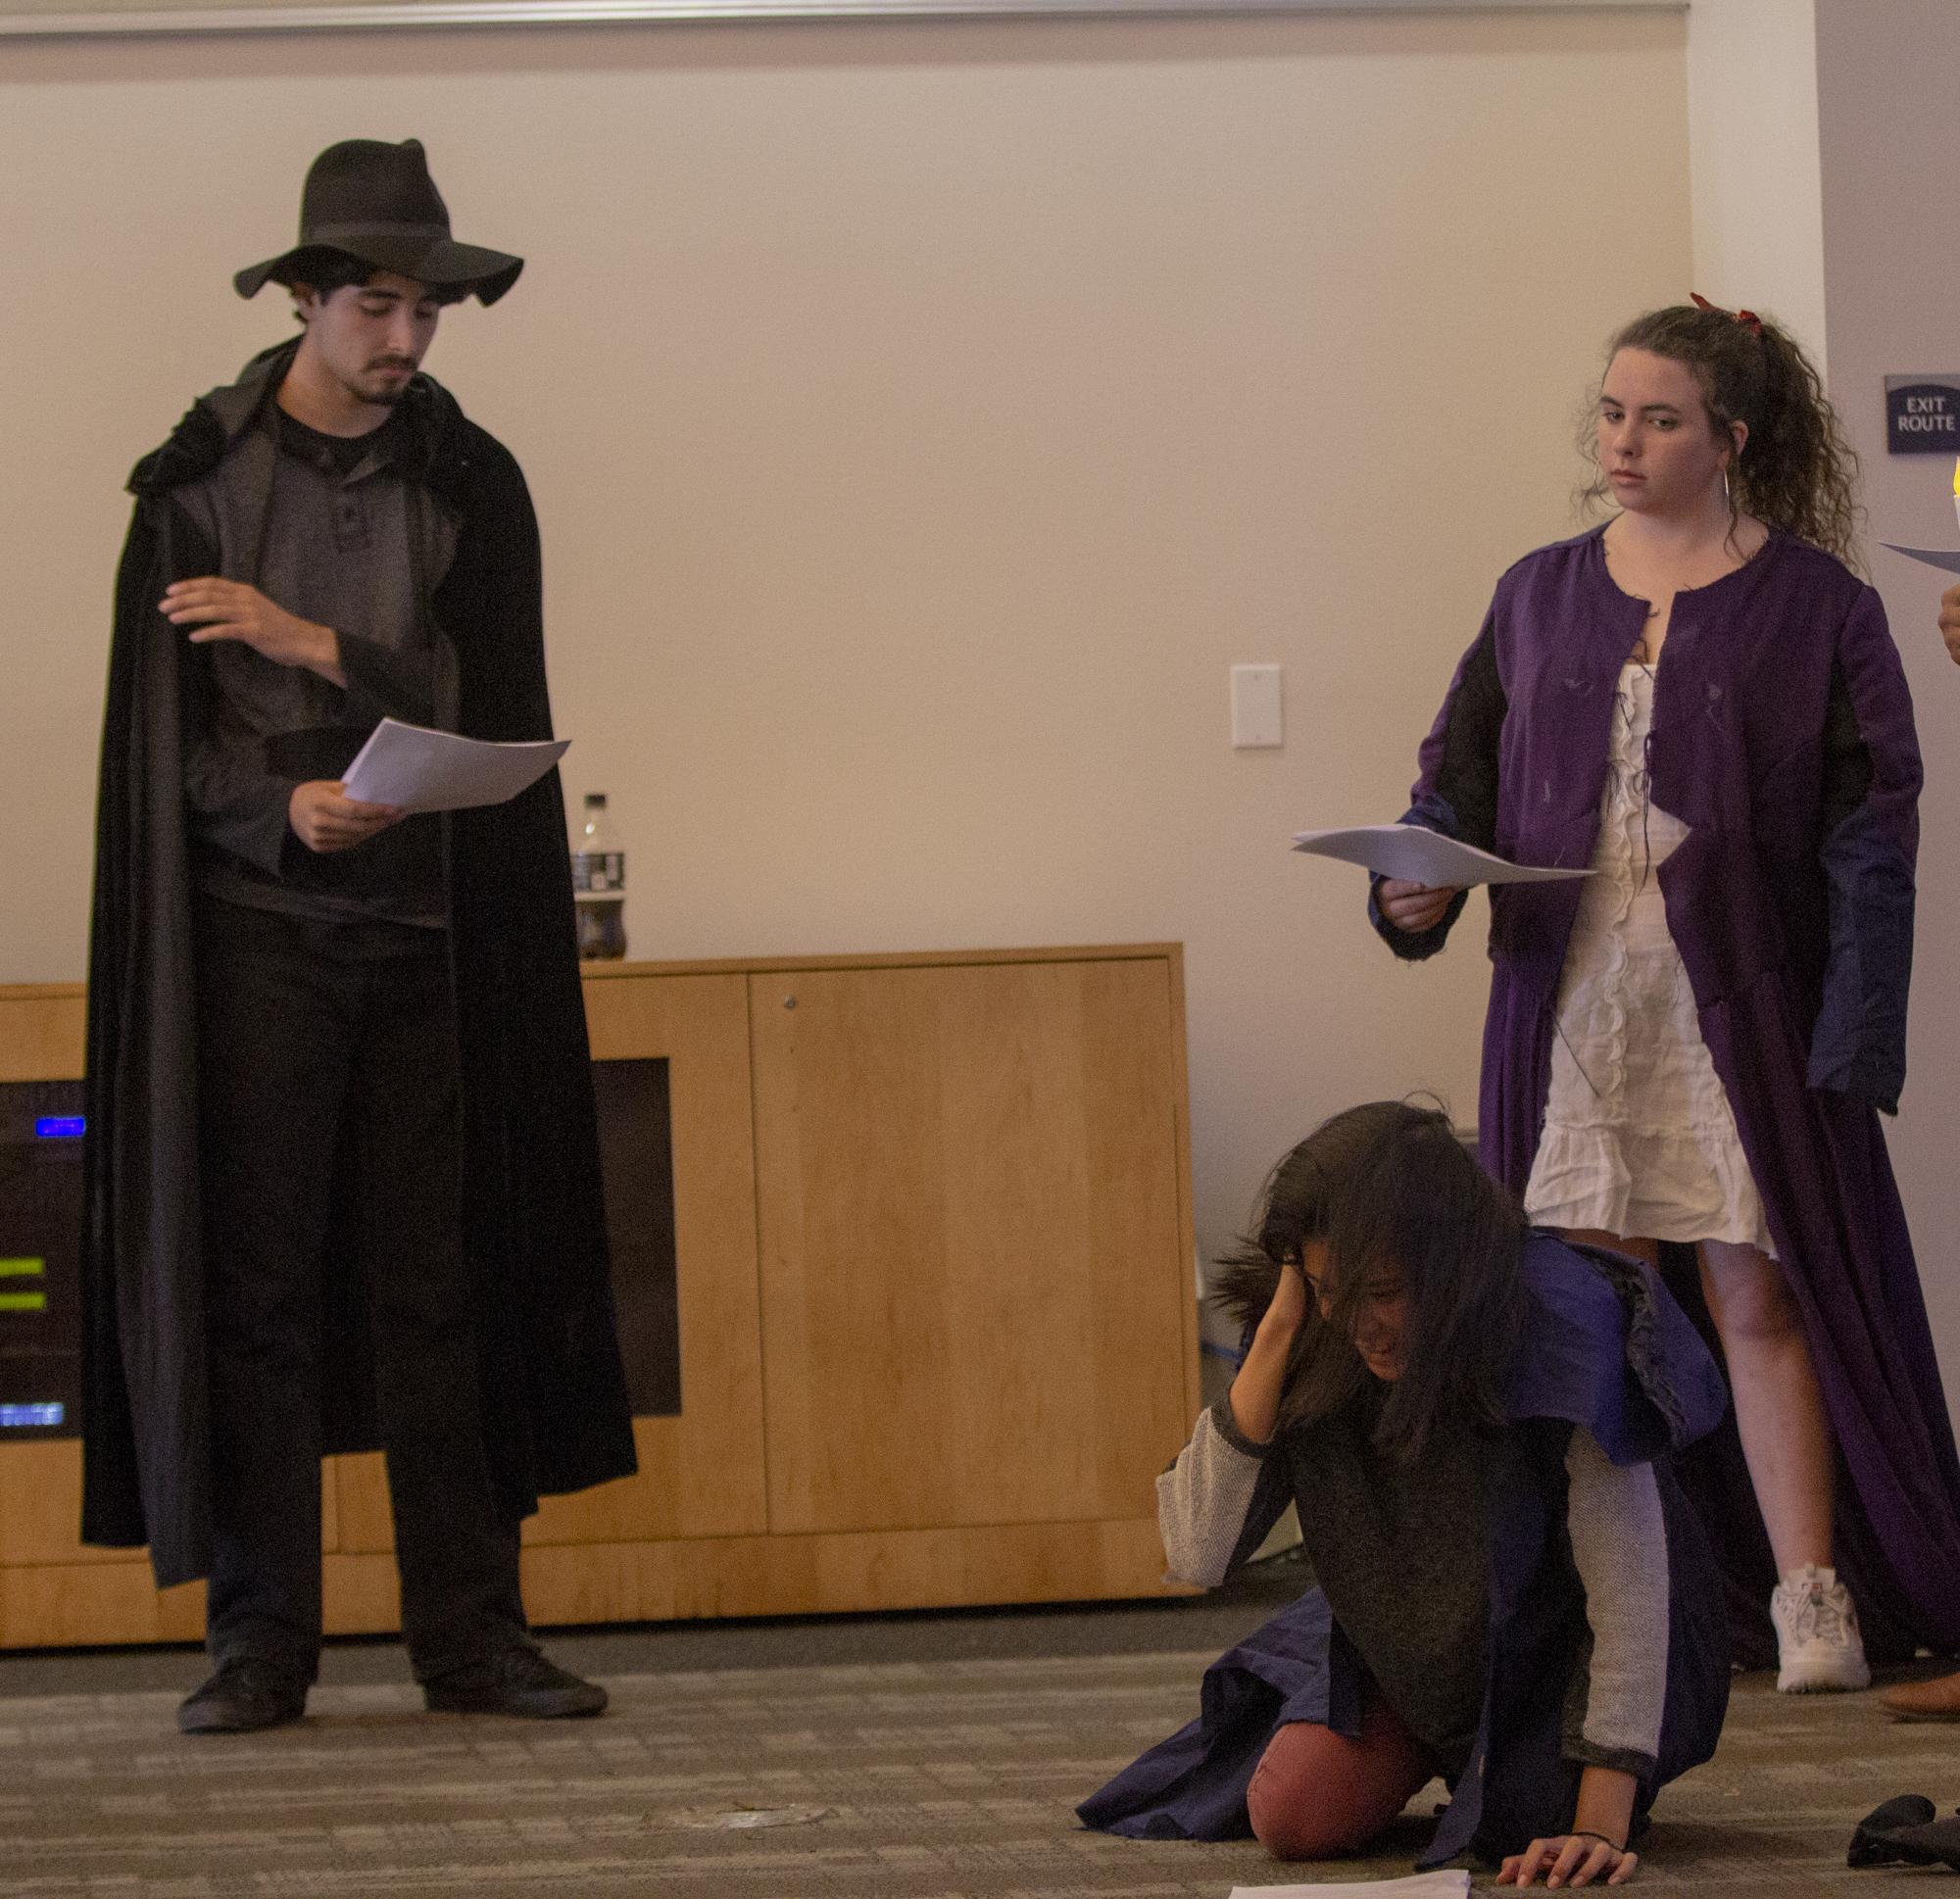 Salem witch trials come to Pierce